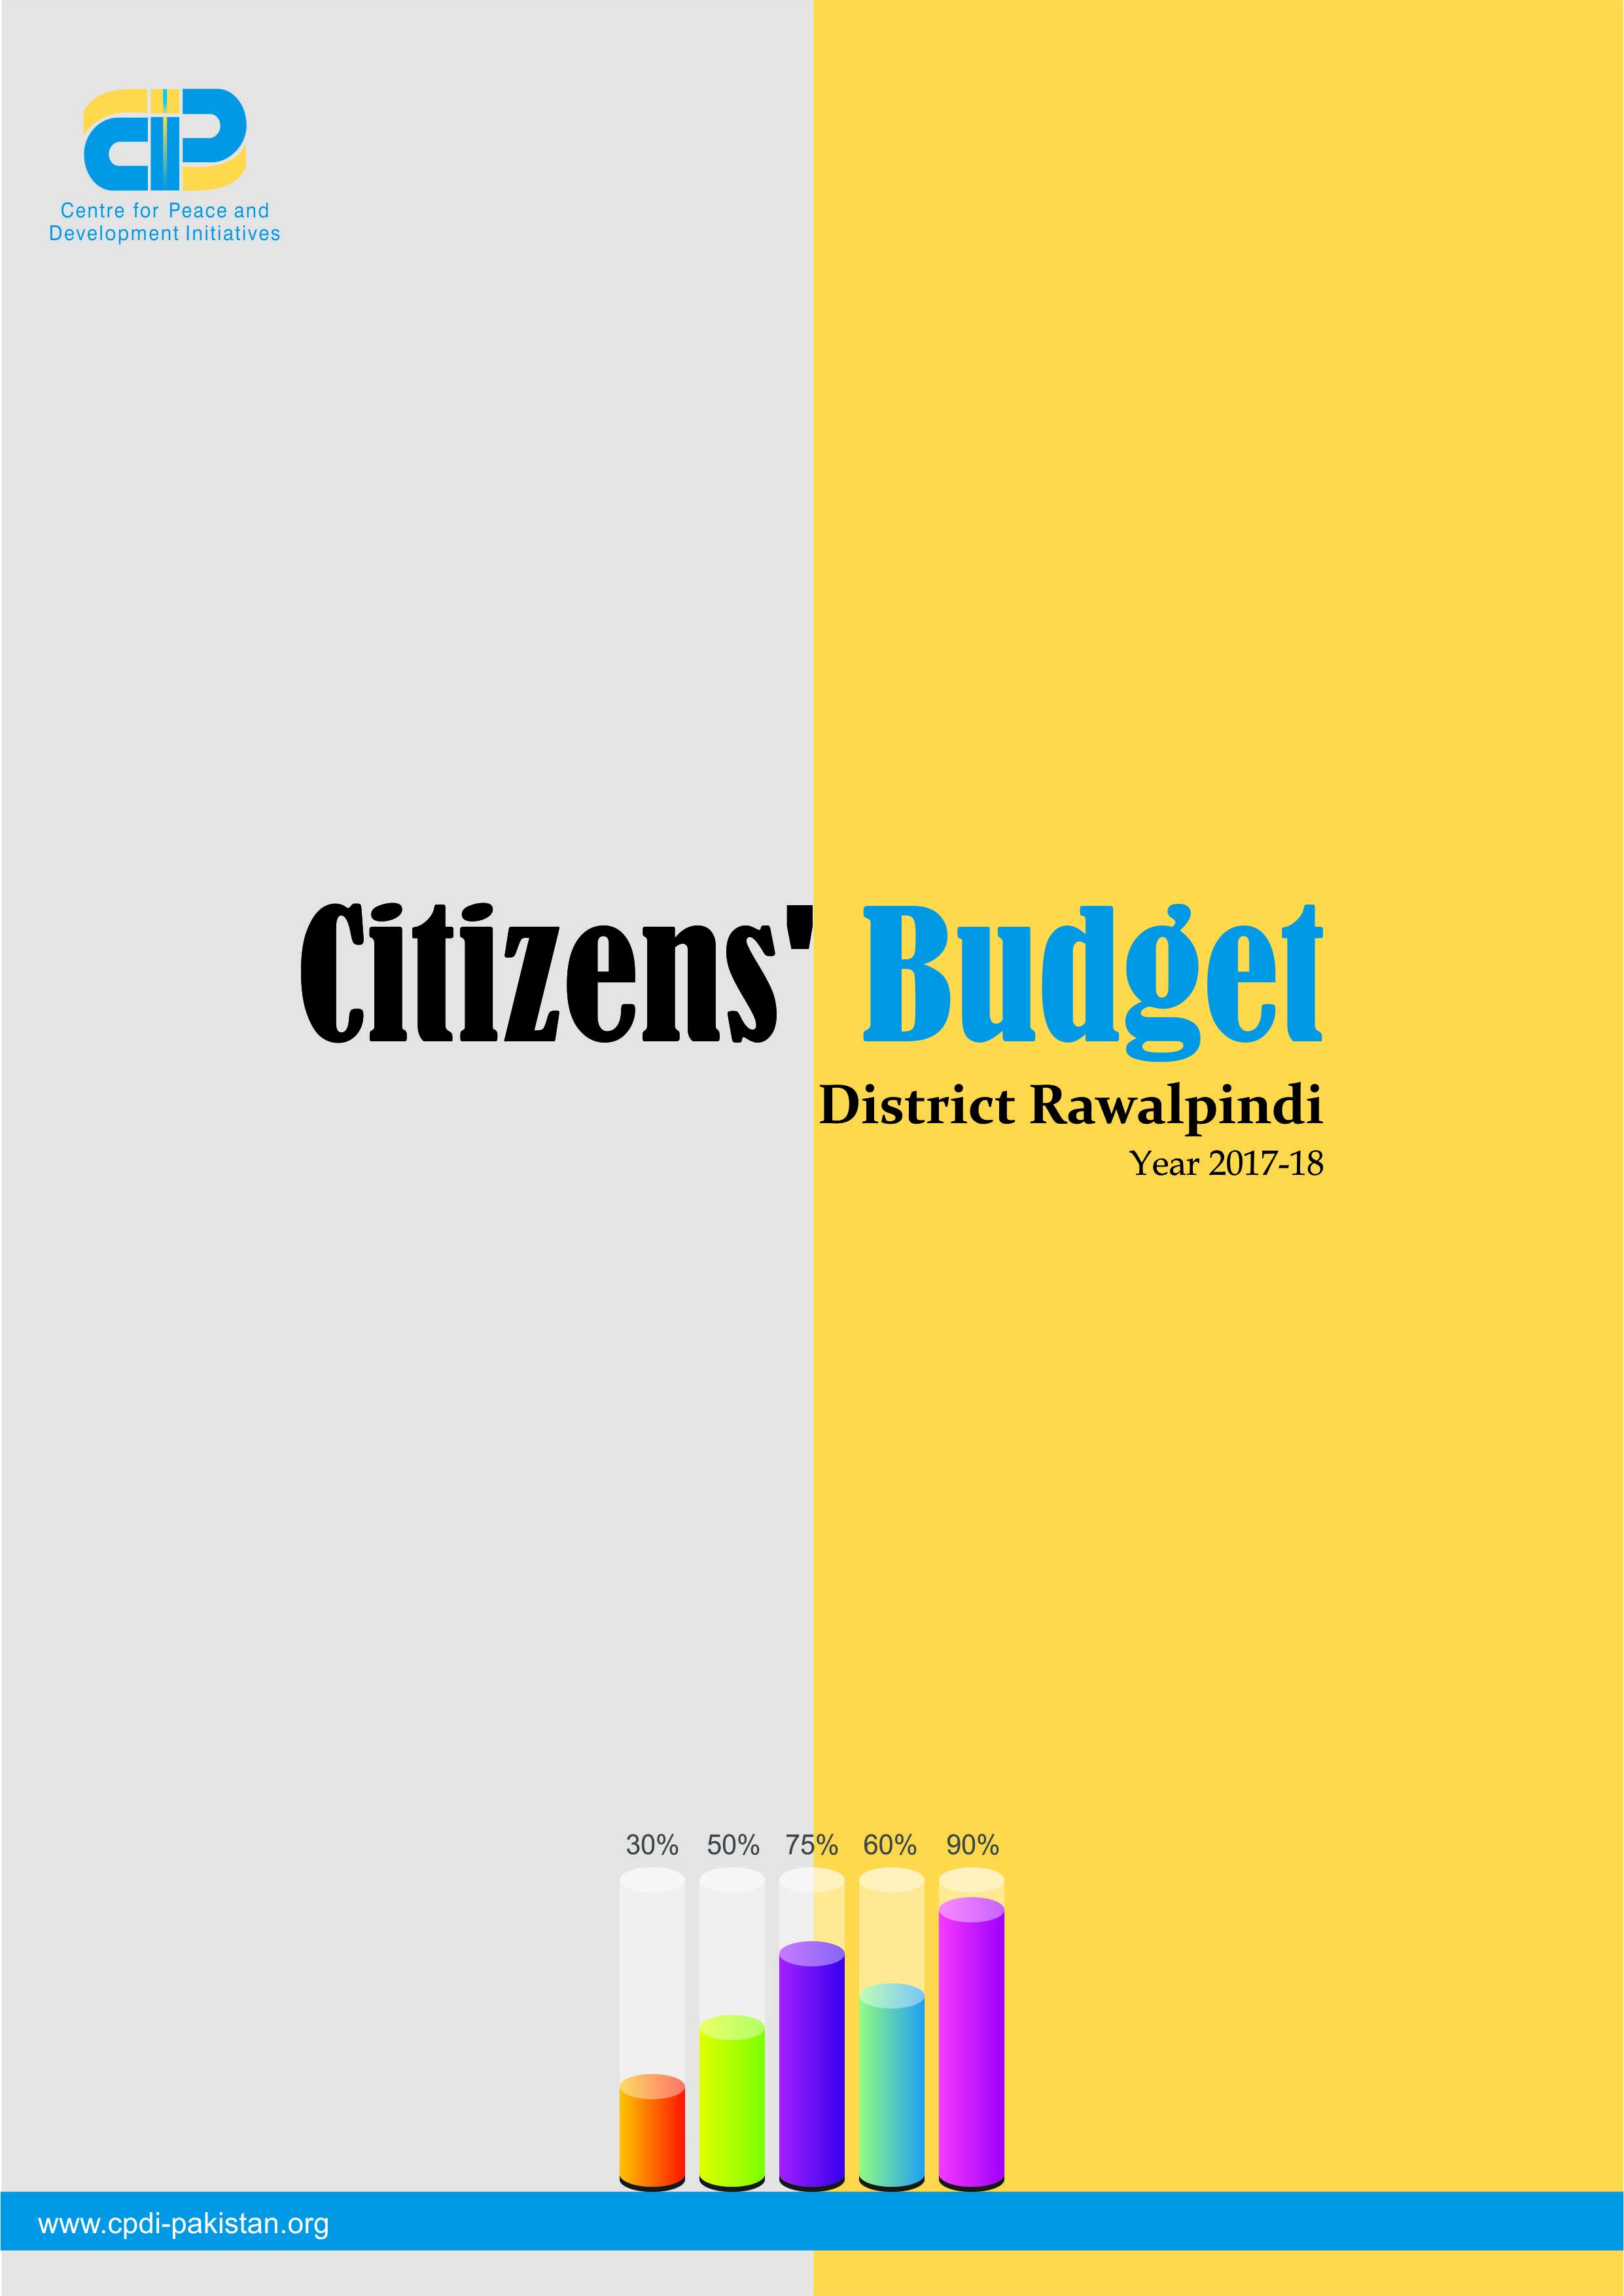 Citizens' Budget District Rawalpindi Year 2017-18